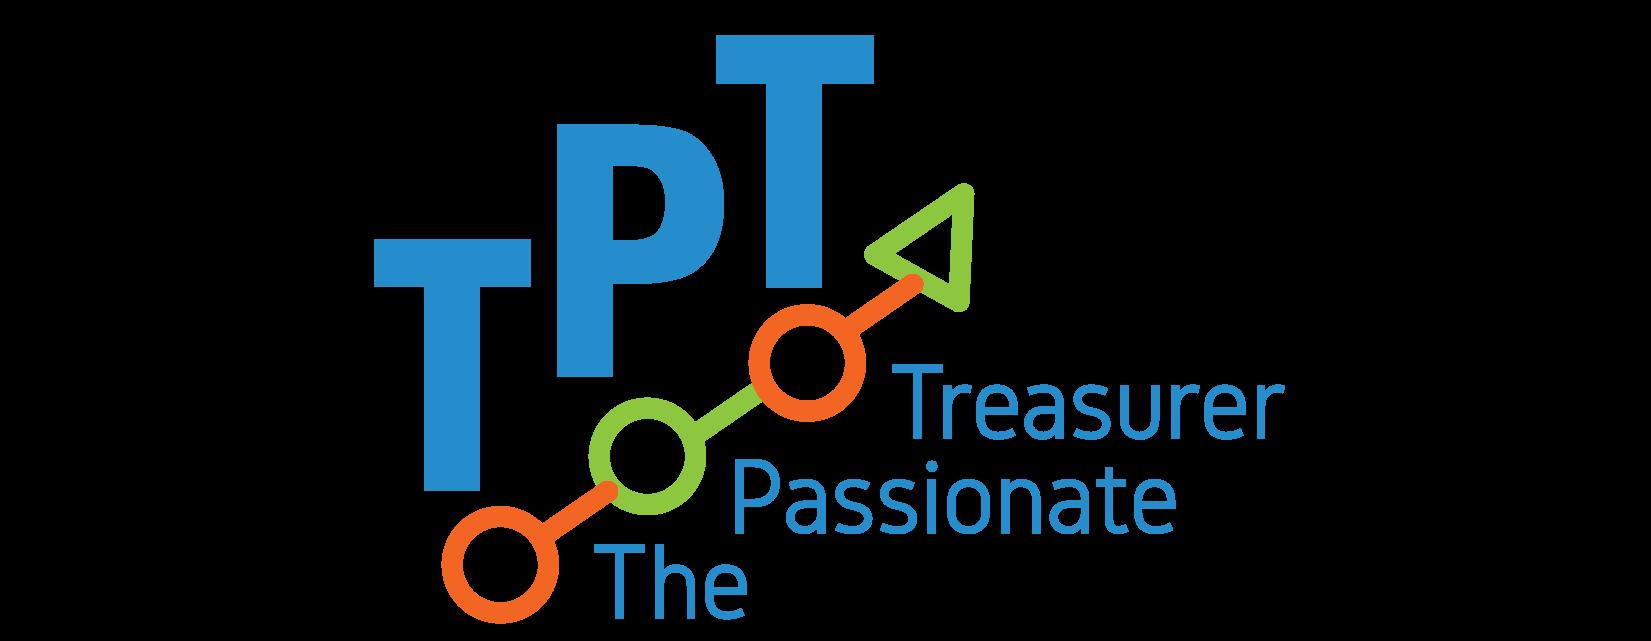 The Passionate Treasurer